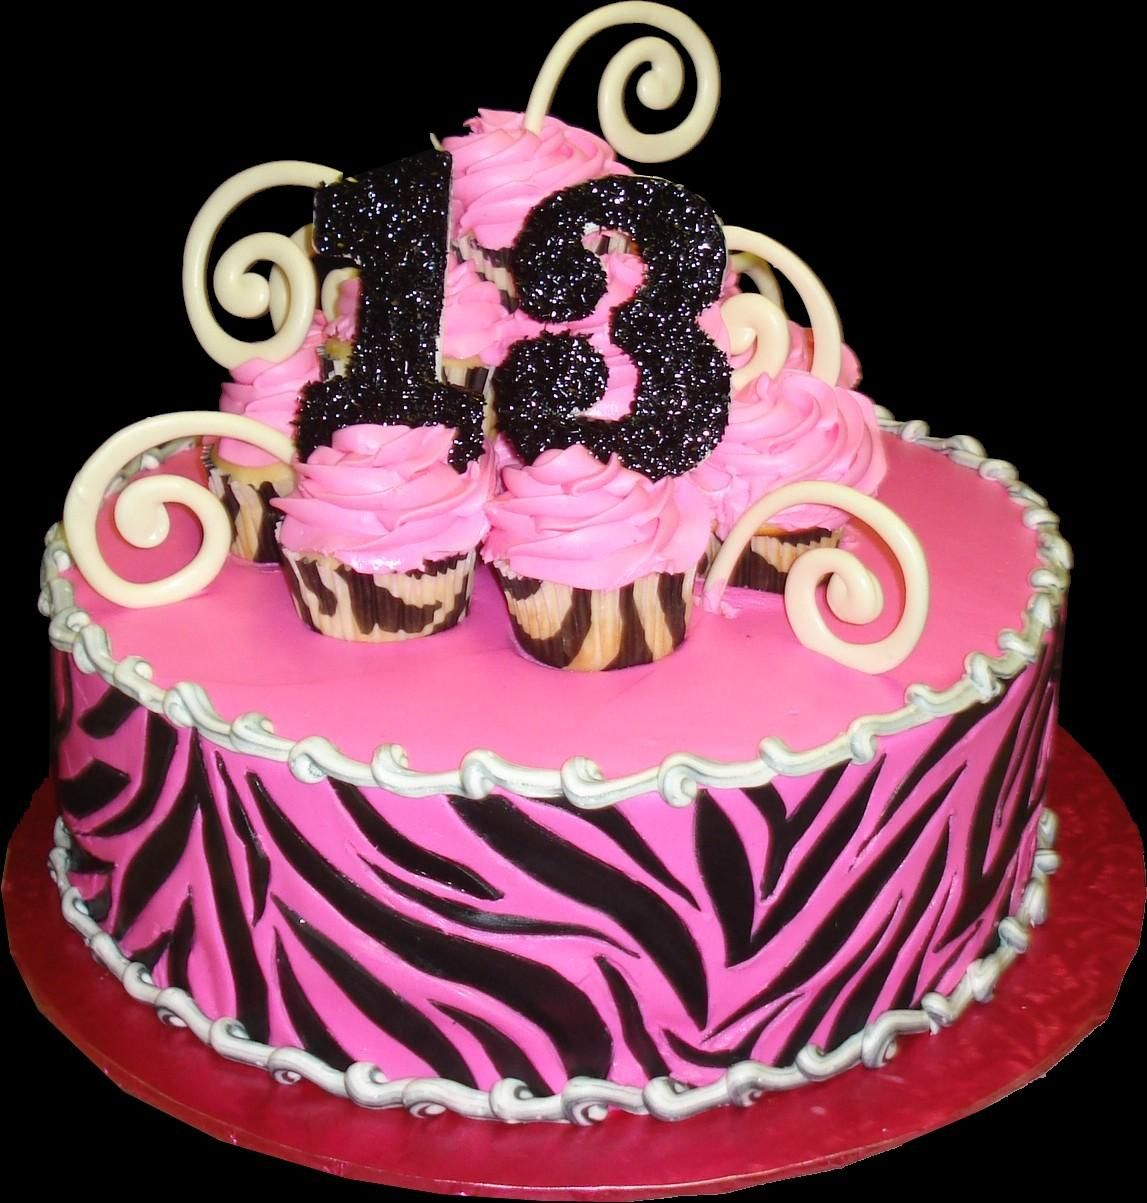 Zebra Pink 13th Birthday Cake. Pink Buttercream Iced